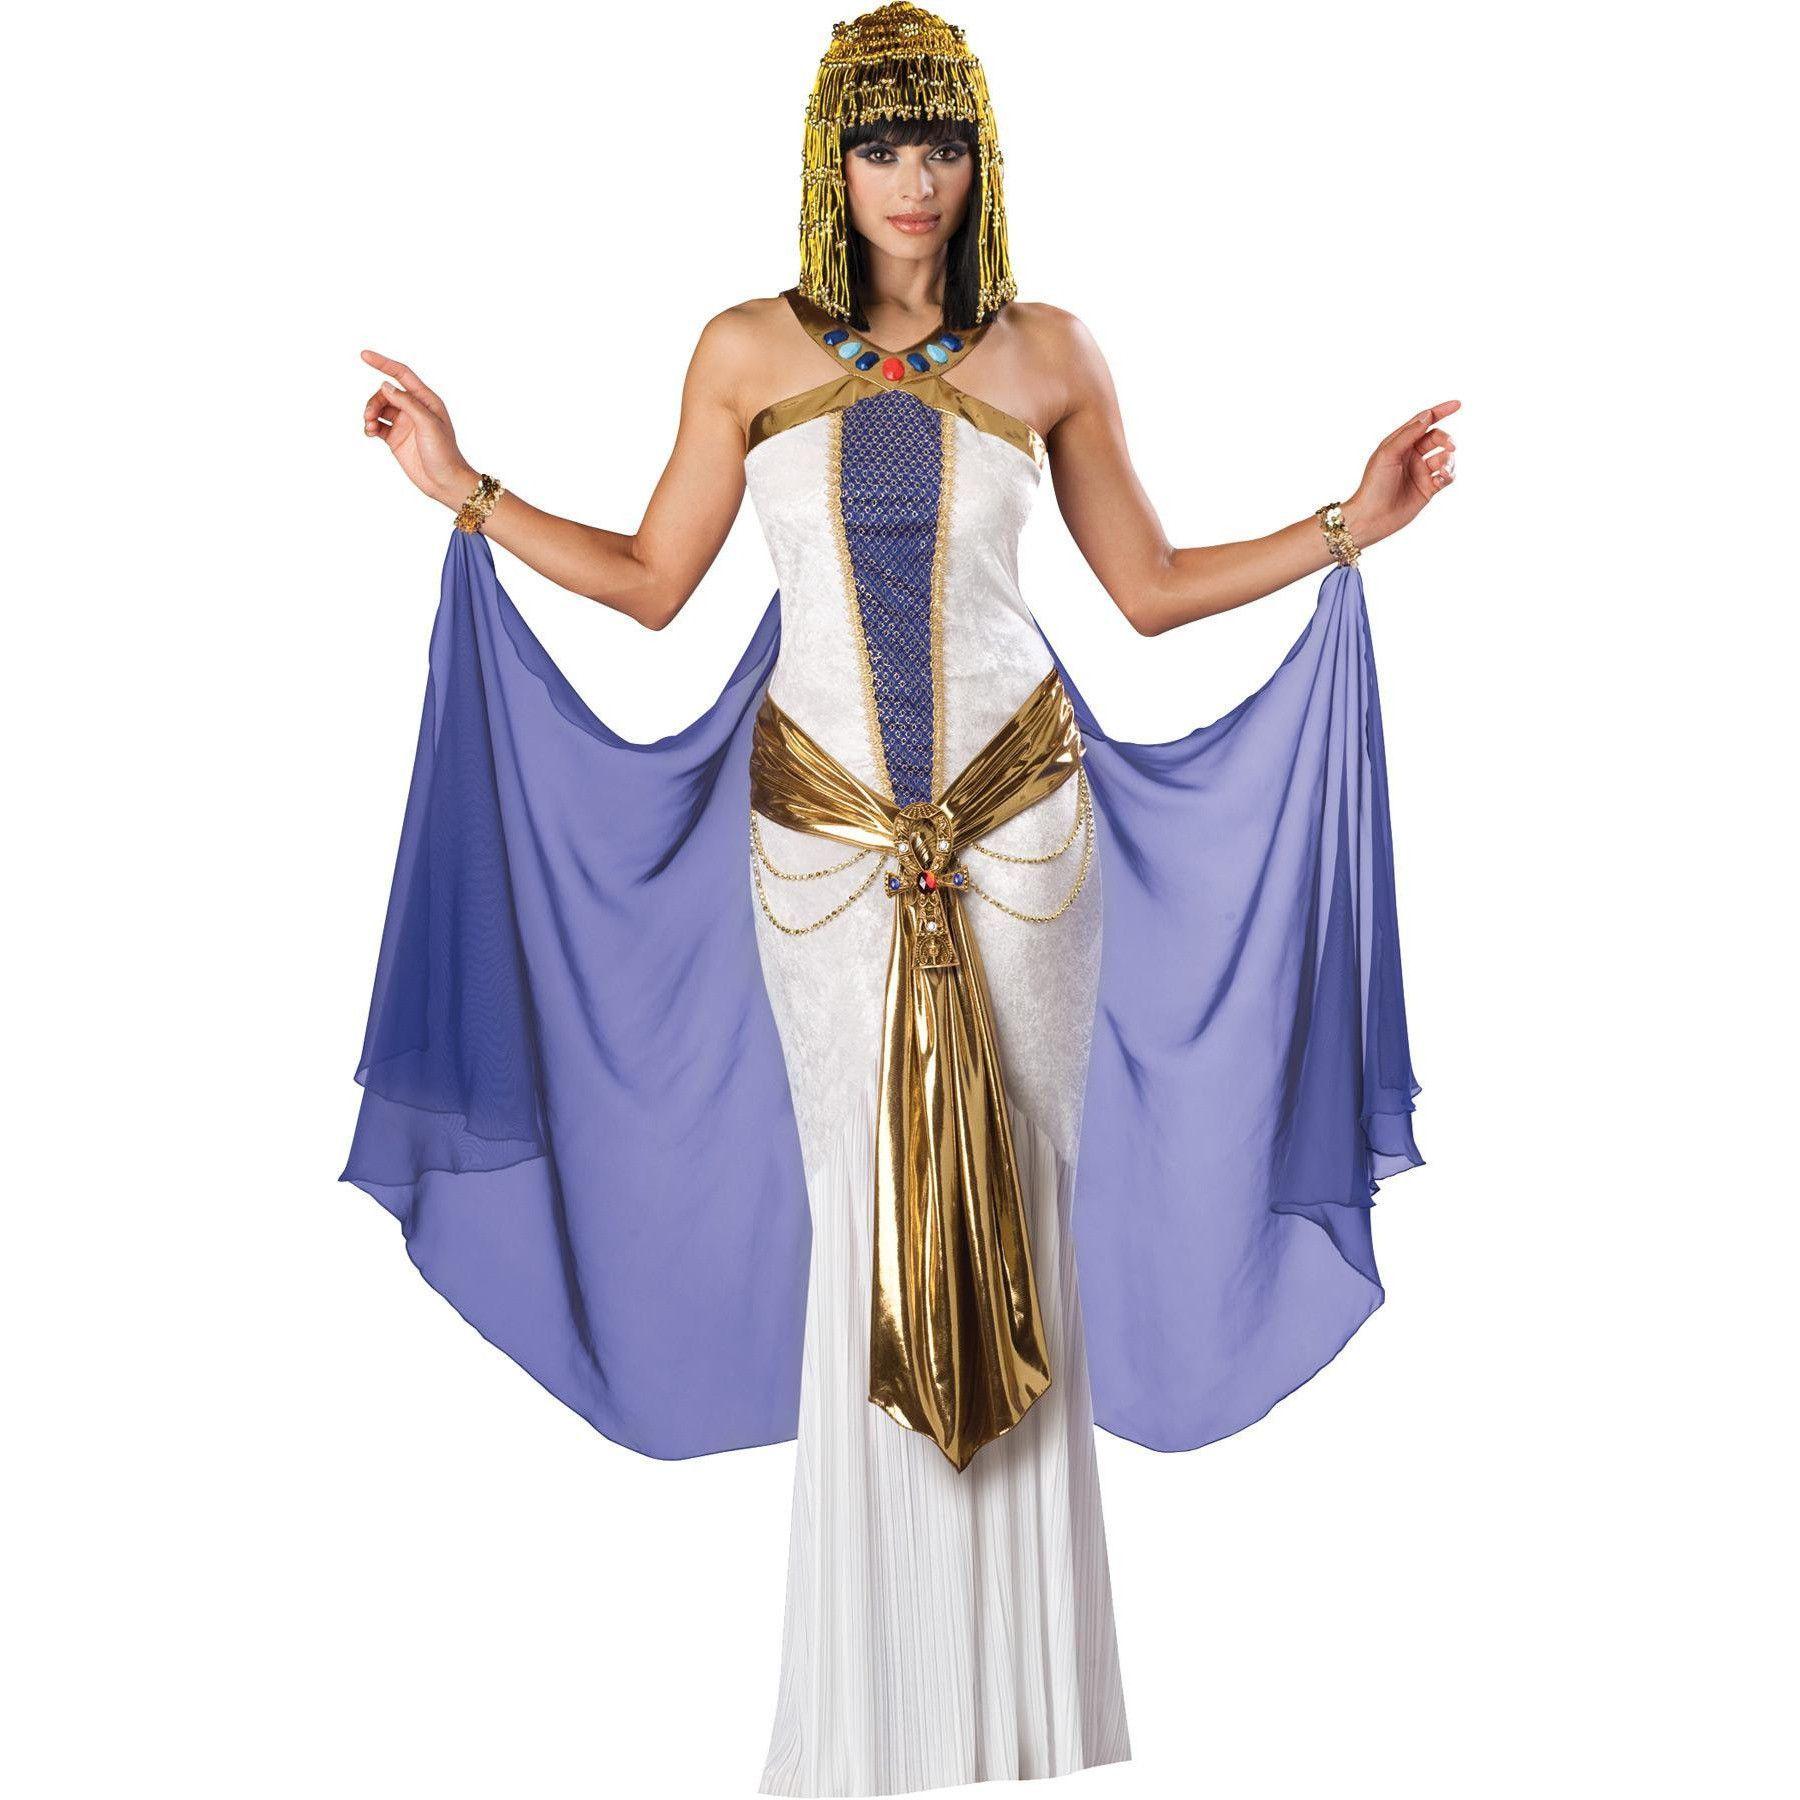 Jewel Of The Nile Elite Lg | Disfrases, Alta costura y Costura